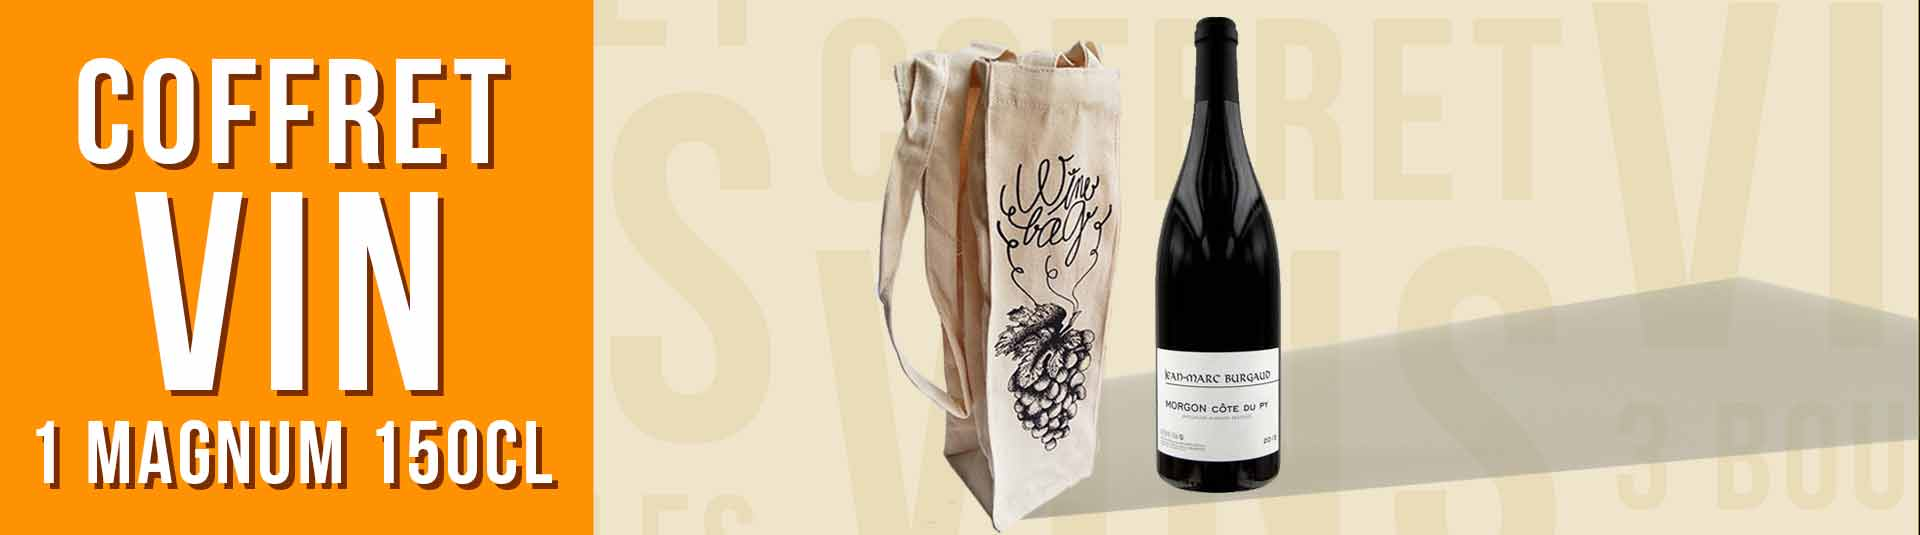 Coffret cadeau vin 1 Magnum Beaujolais Morgon